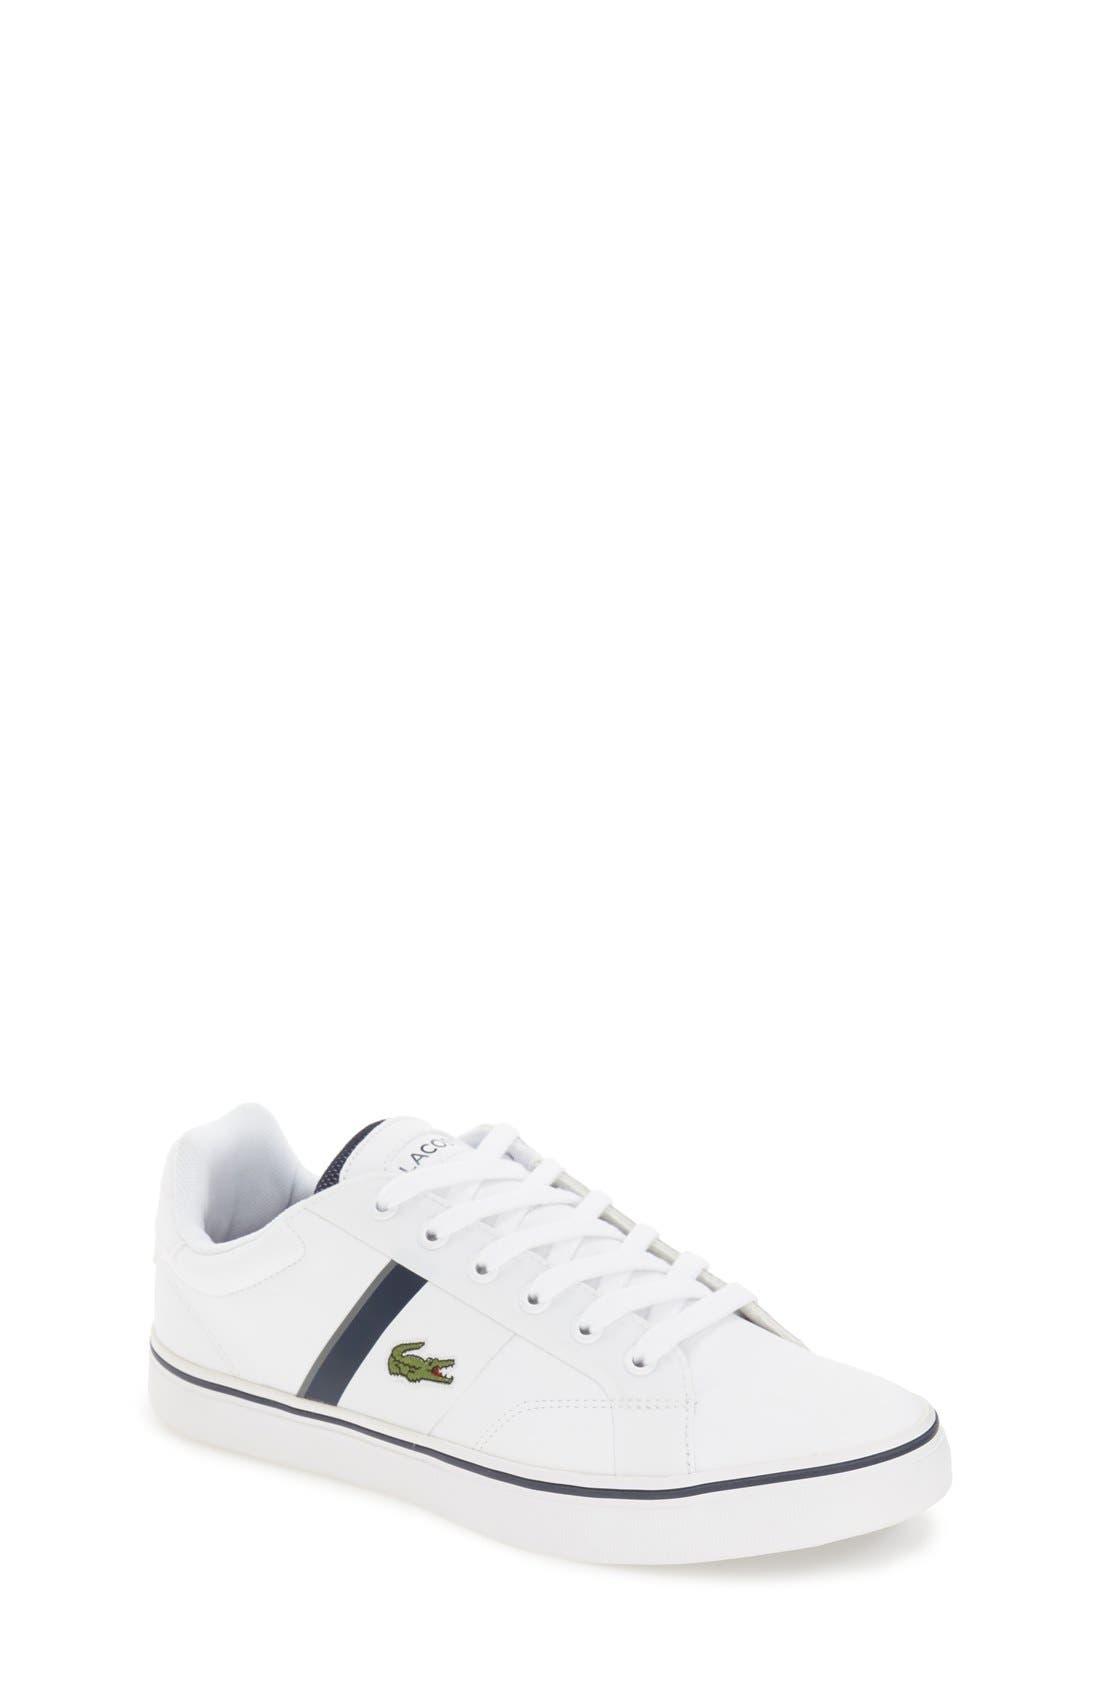 LACOSTE 'Fairland' Sneaker